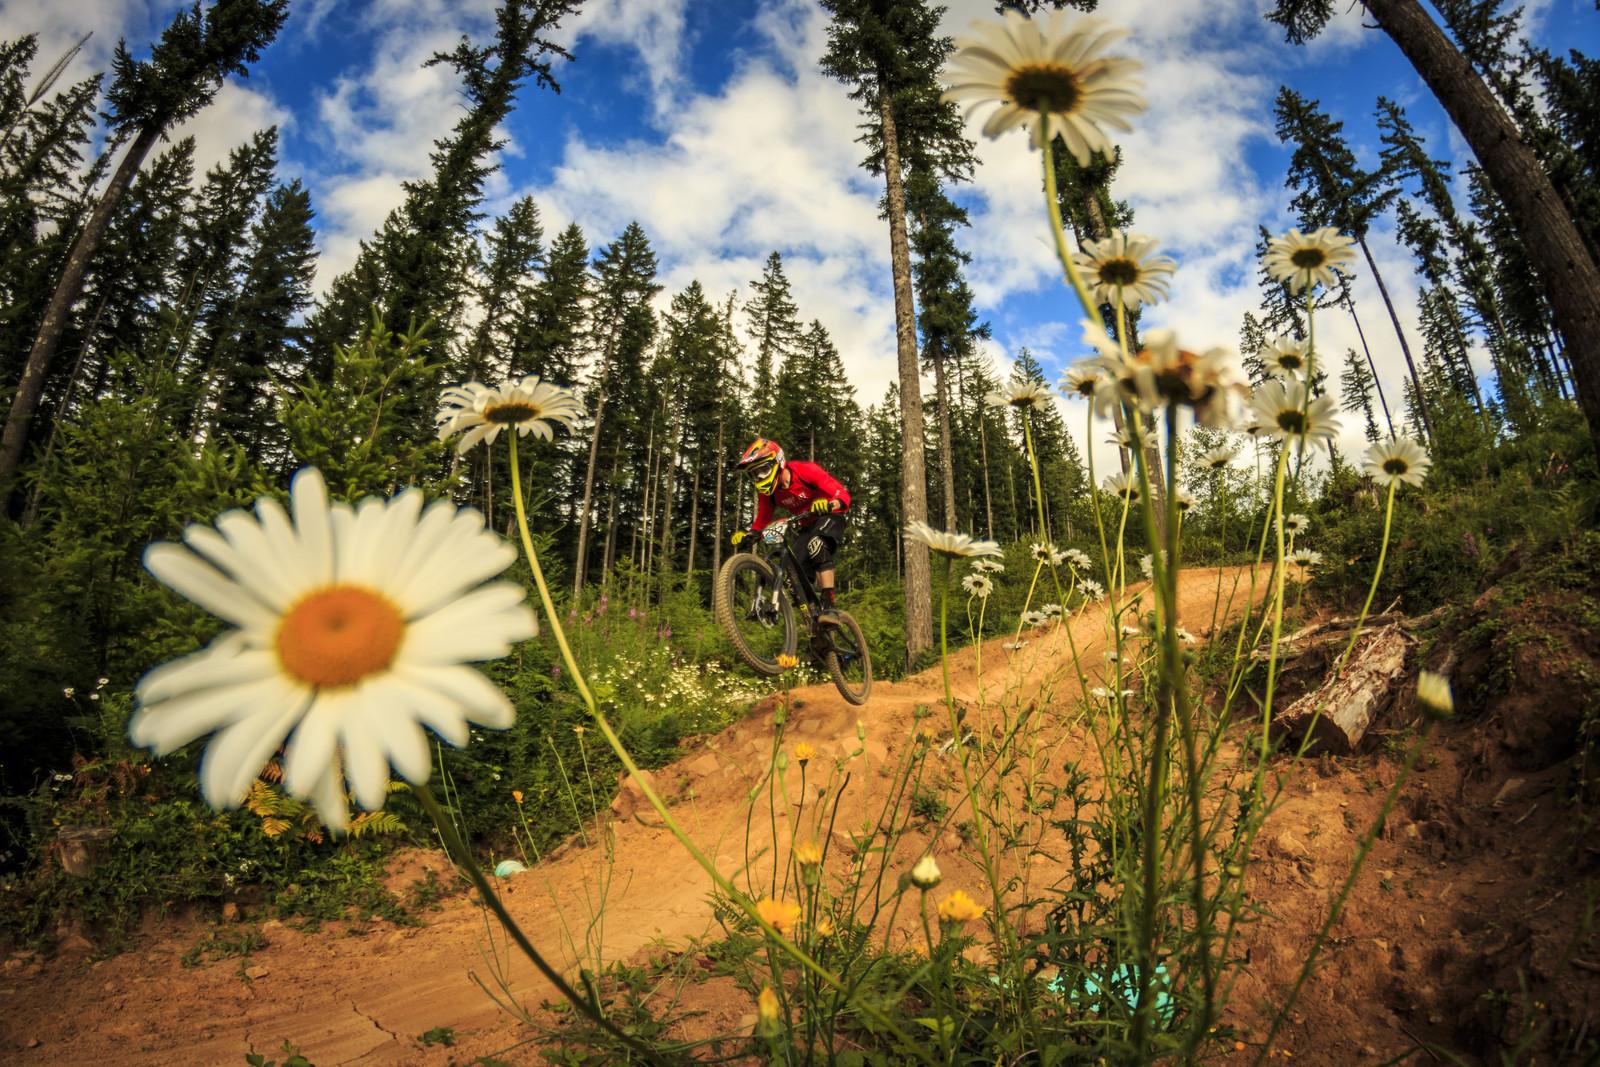 Brandon Porter, Oregon Enduro, Cold Creek - 2014 Oregon Enduro, Cold Creek - Mountain Biking Pictures - Vital MTB